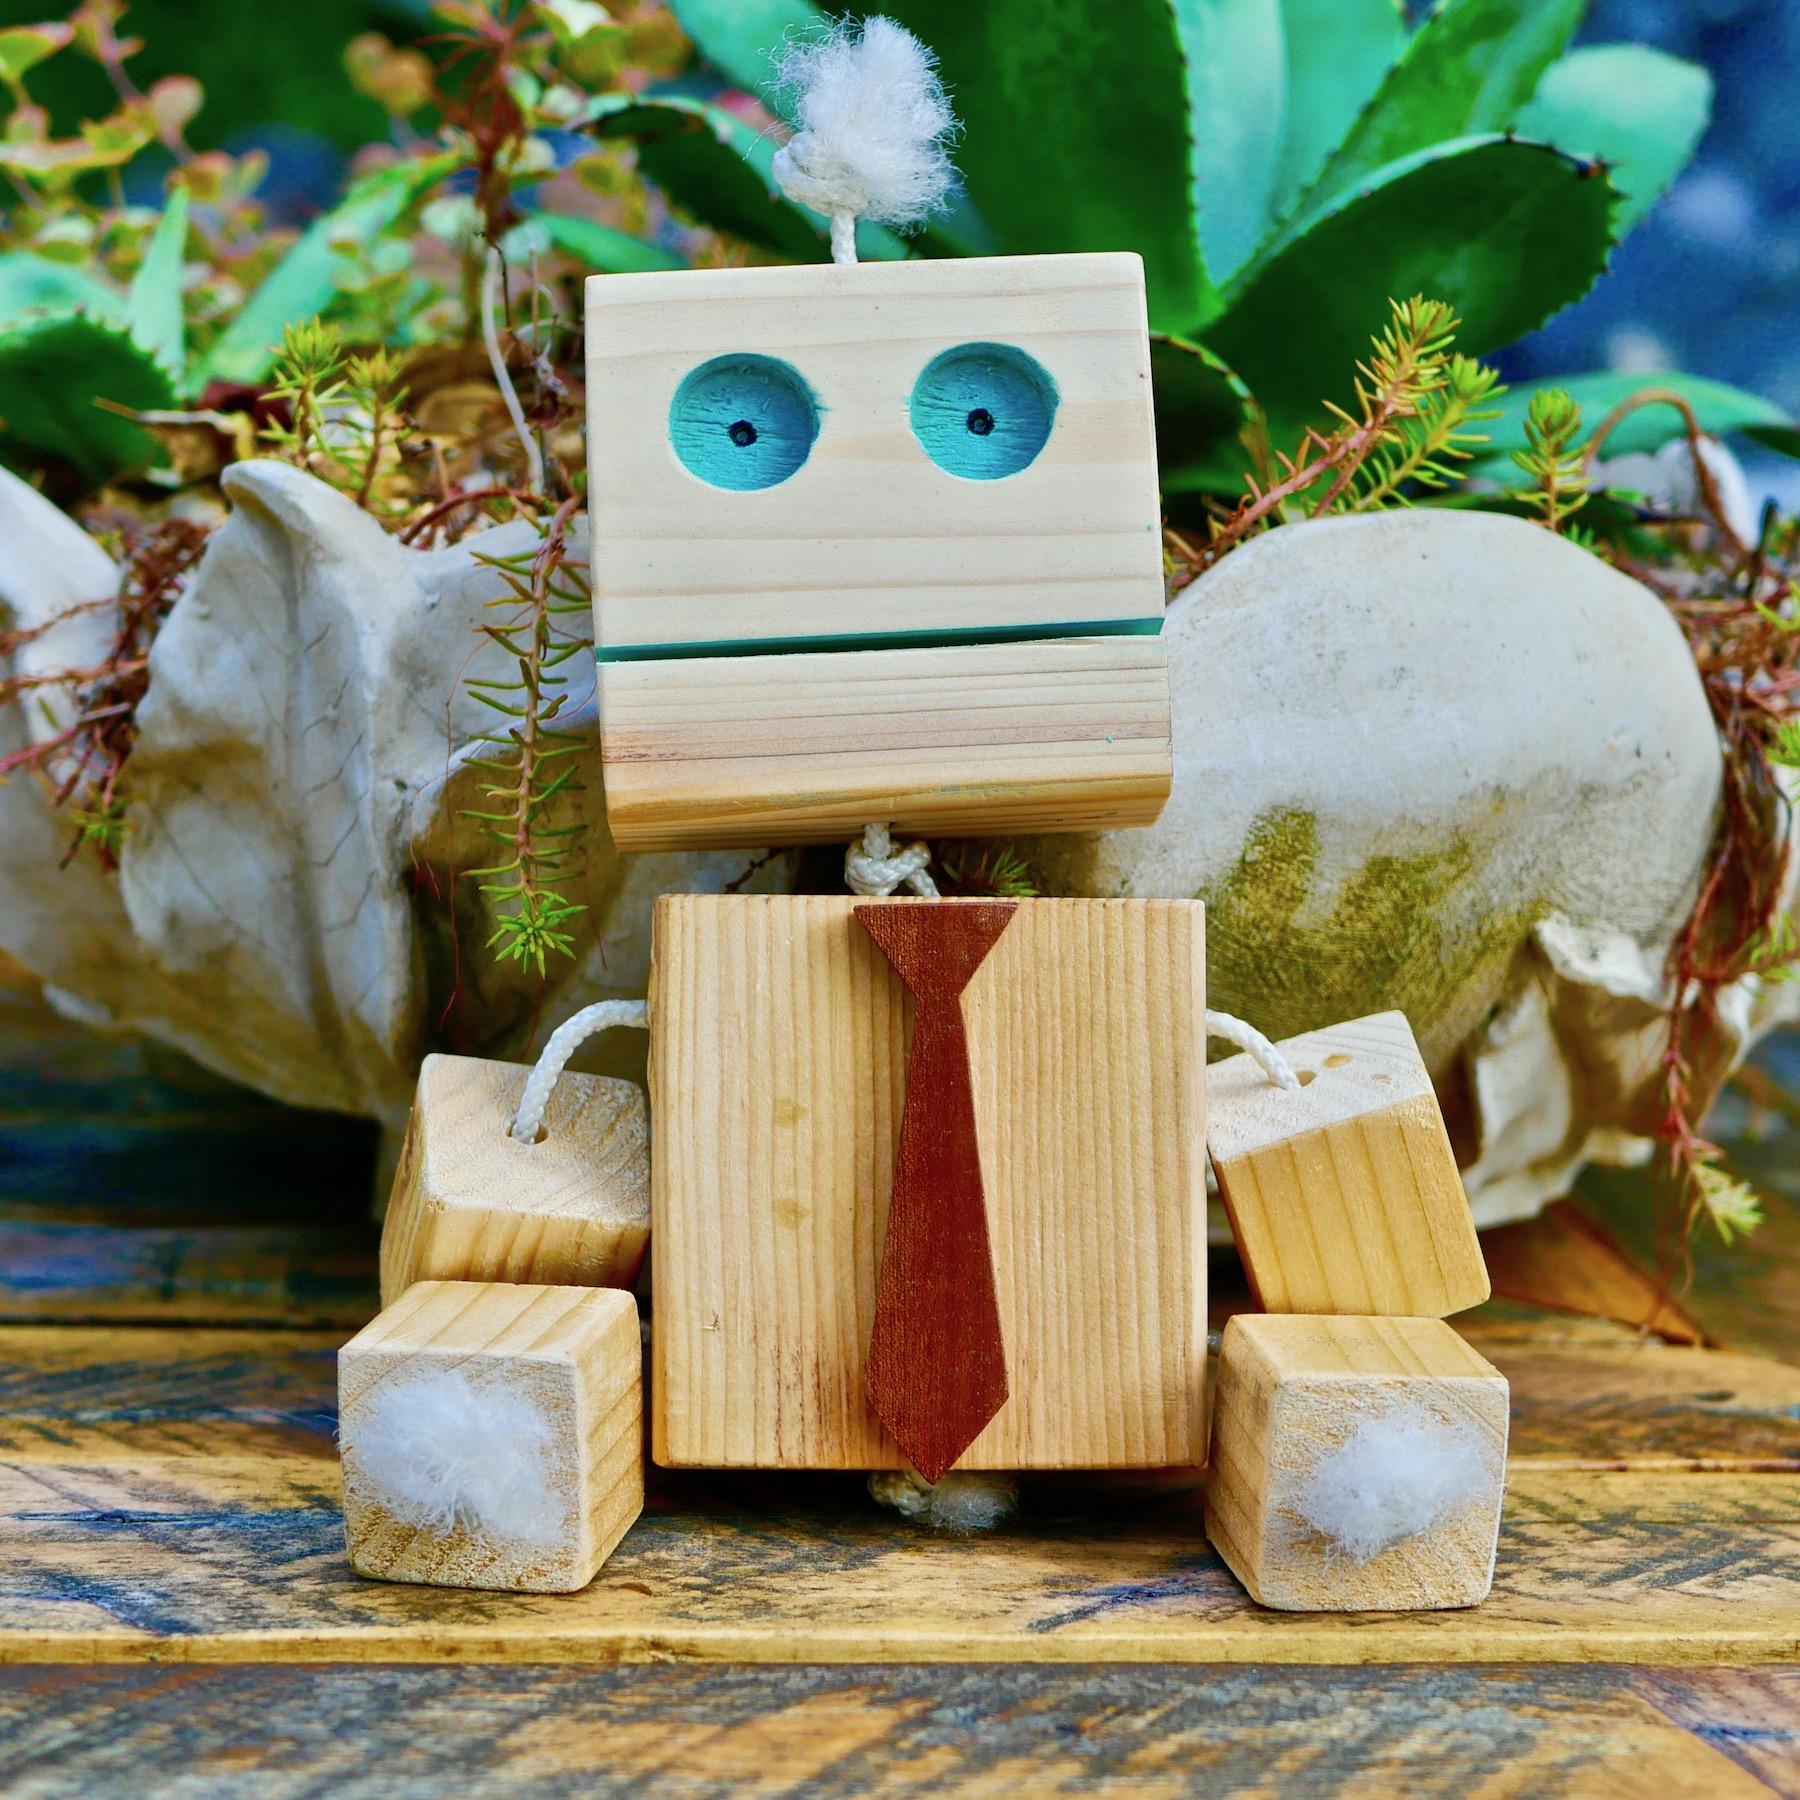 wooden-toy-robot-homemade-diy.jpg